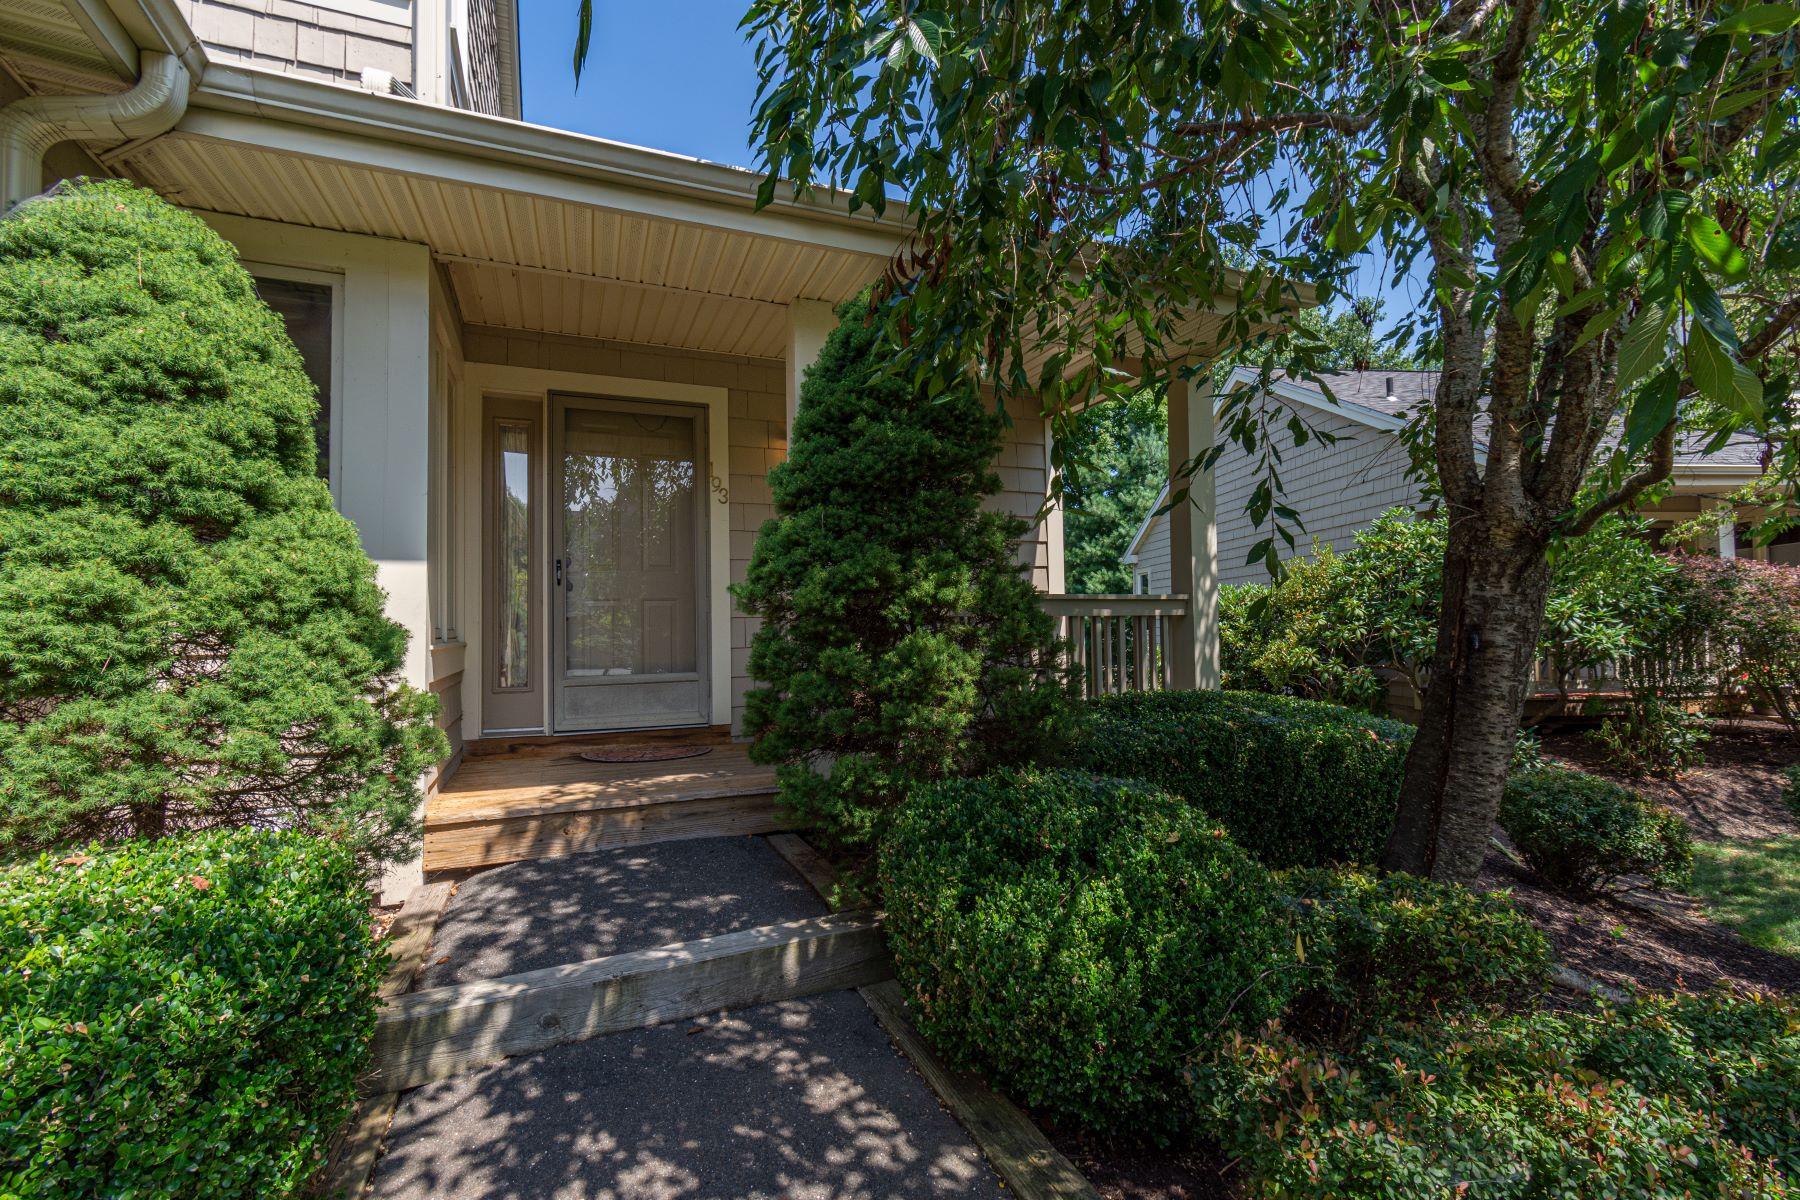 townhouses 为 销售 在 Lake Place Condo 12 Boulevard Drive 193, 丹伯里, 康涅狄格州 06810 美国